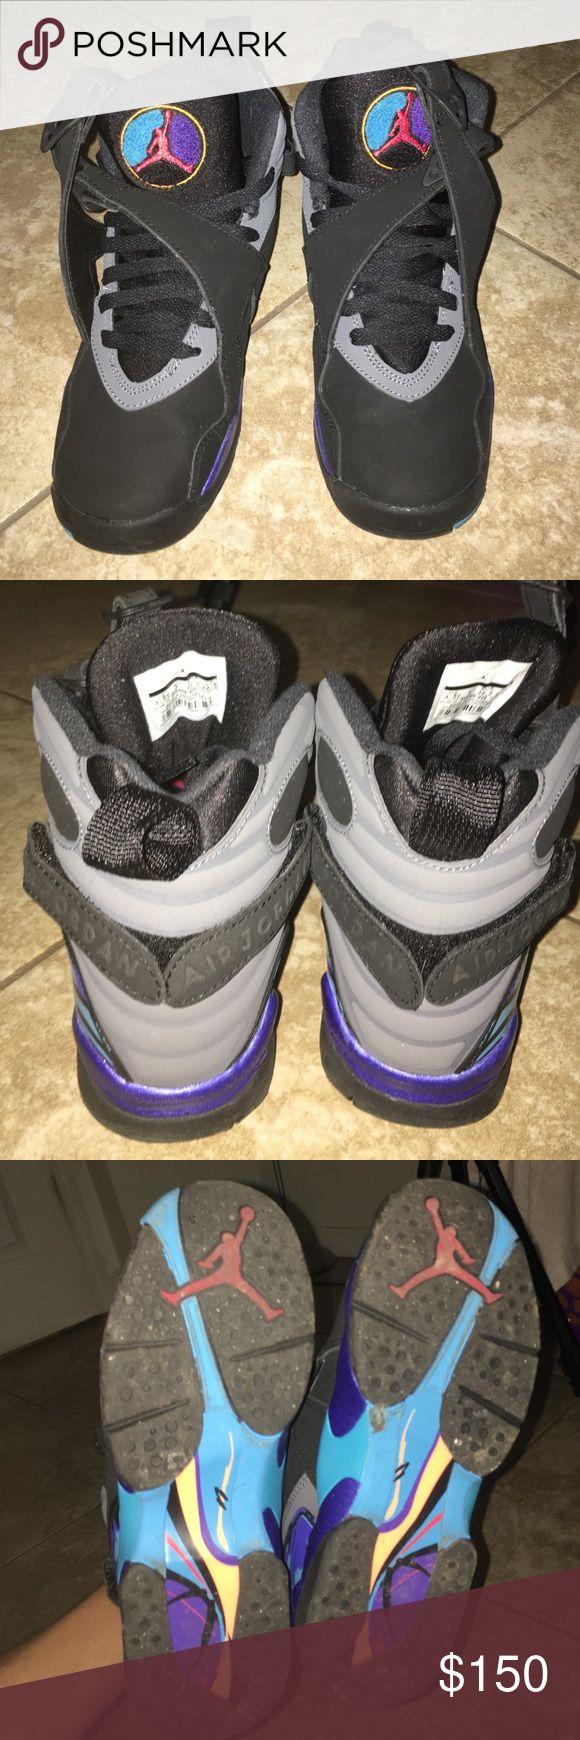 Jordan Aqua 8s. Kids Size 3.5 BRAND NEW BARELY WORN Jordan Aqua 8s. Kids size 3.5  also comes with box. Jordan Shoes